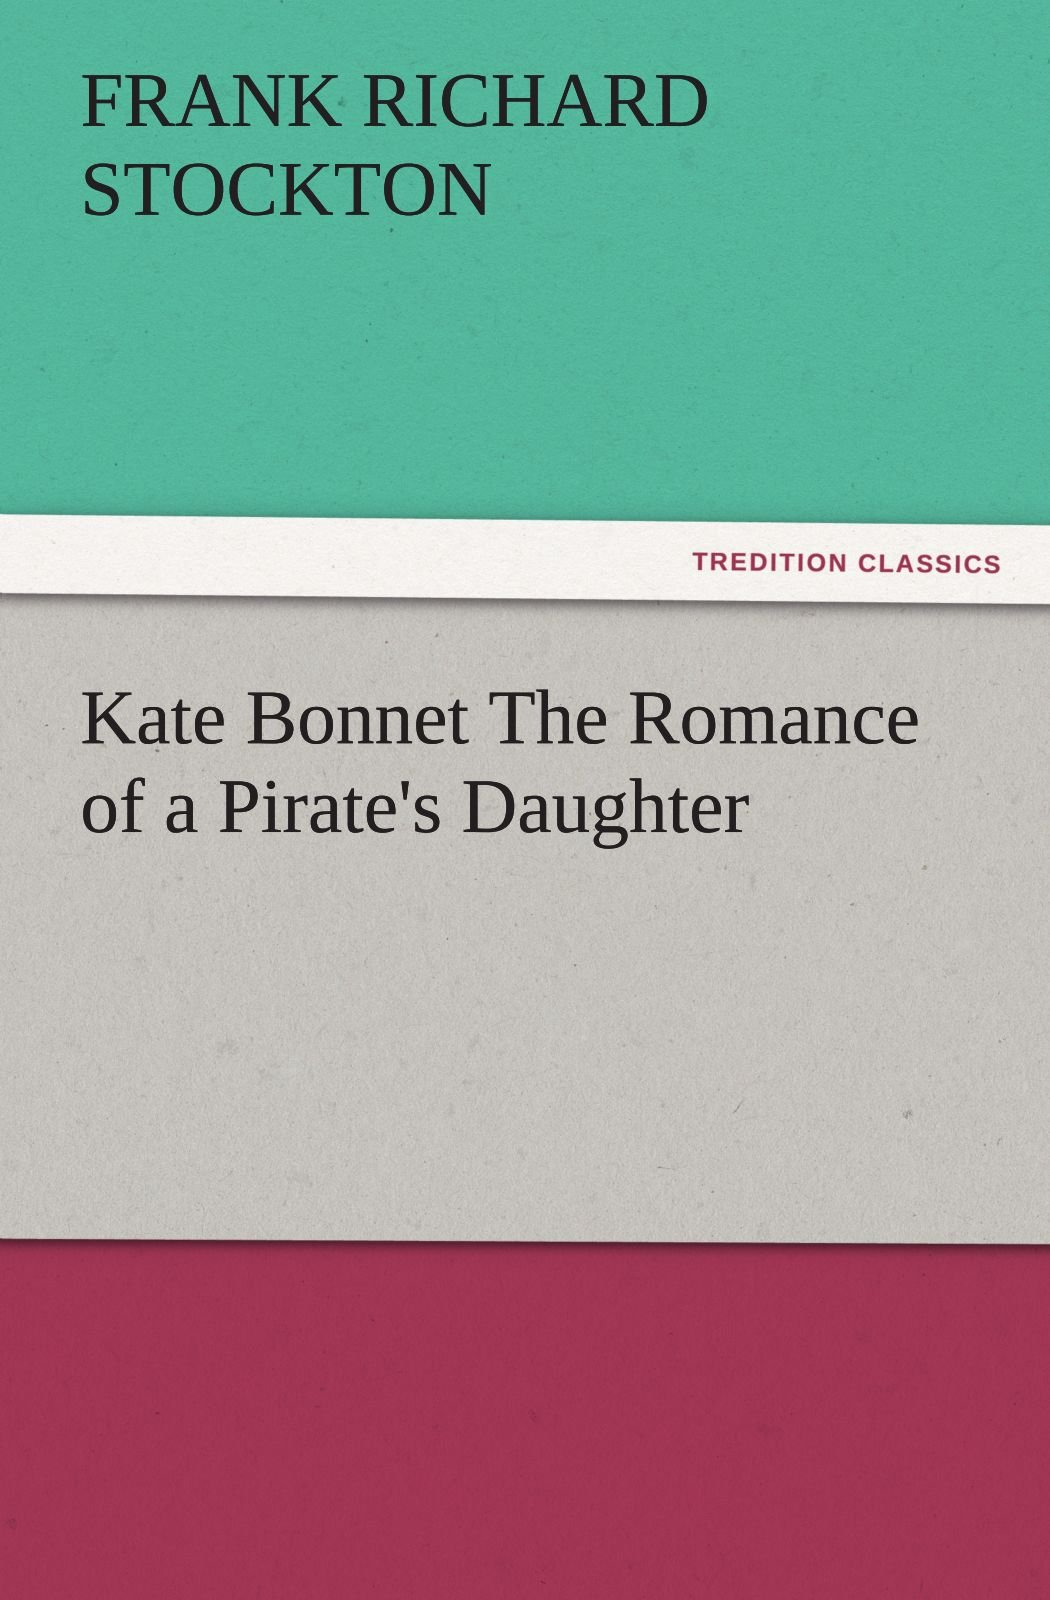 Kate Bonnet The Romance of a Pirate's Daughter (TREDITION CLASSICS) pdf epub